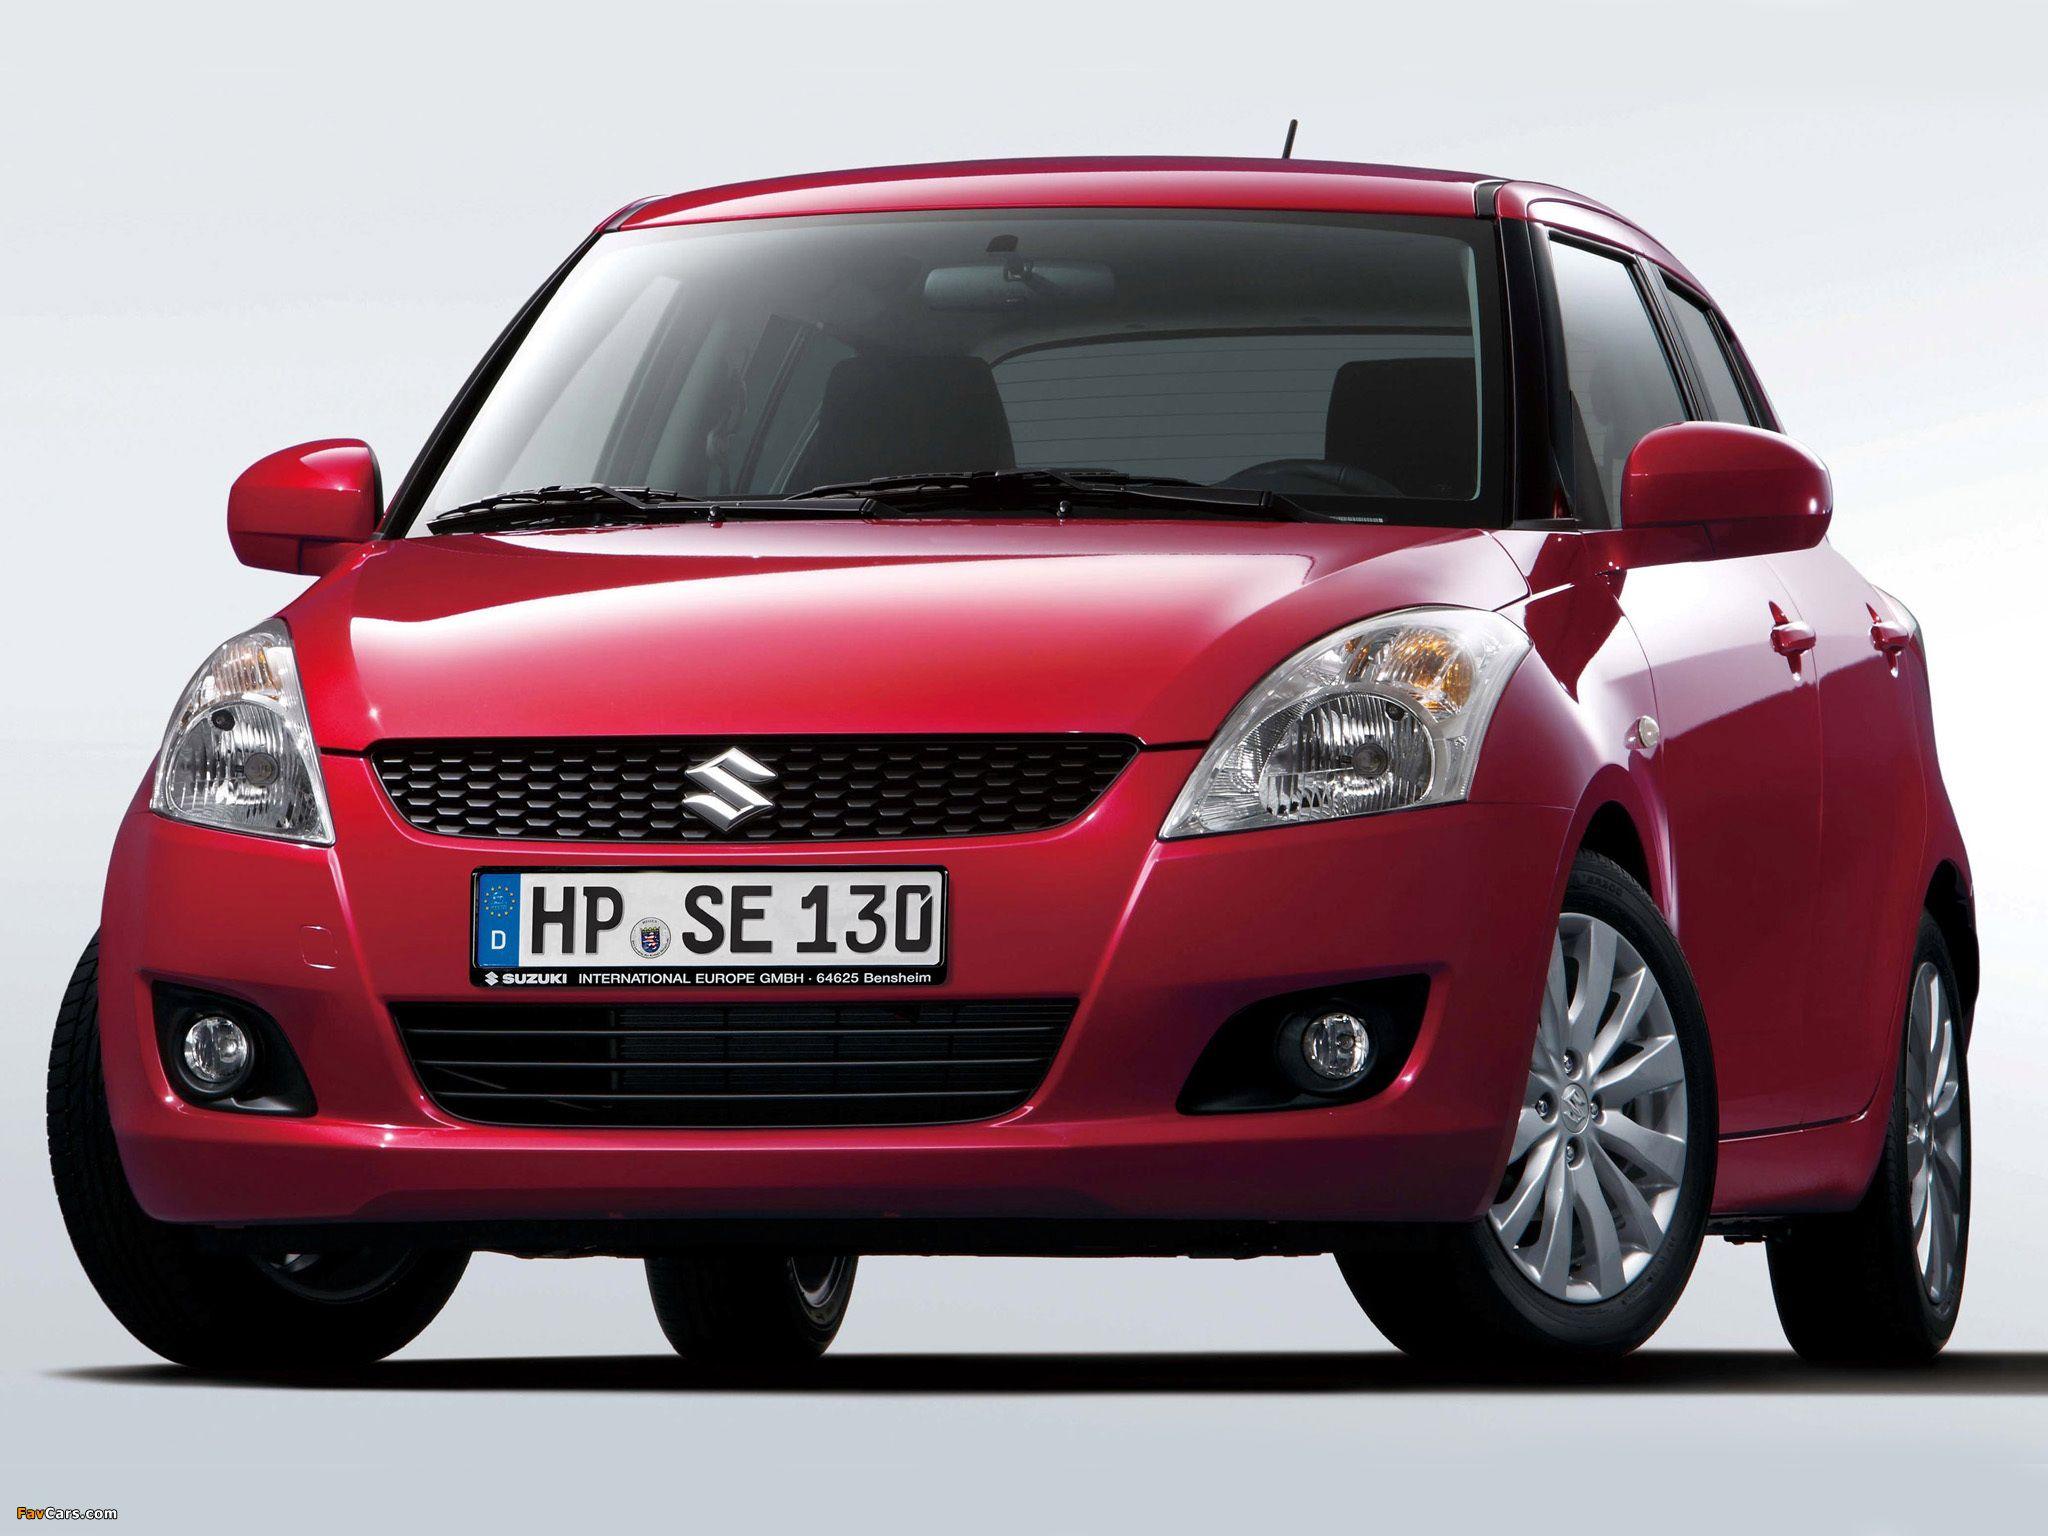 Suzuki Swift 5door 2010 pictures (With images) Suzuki